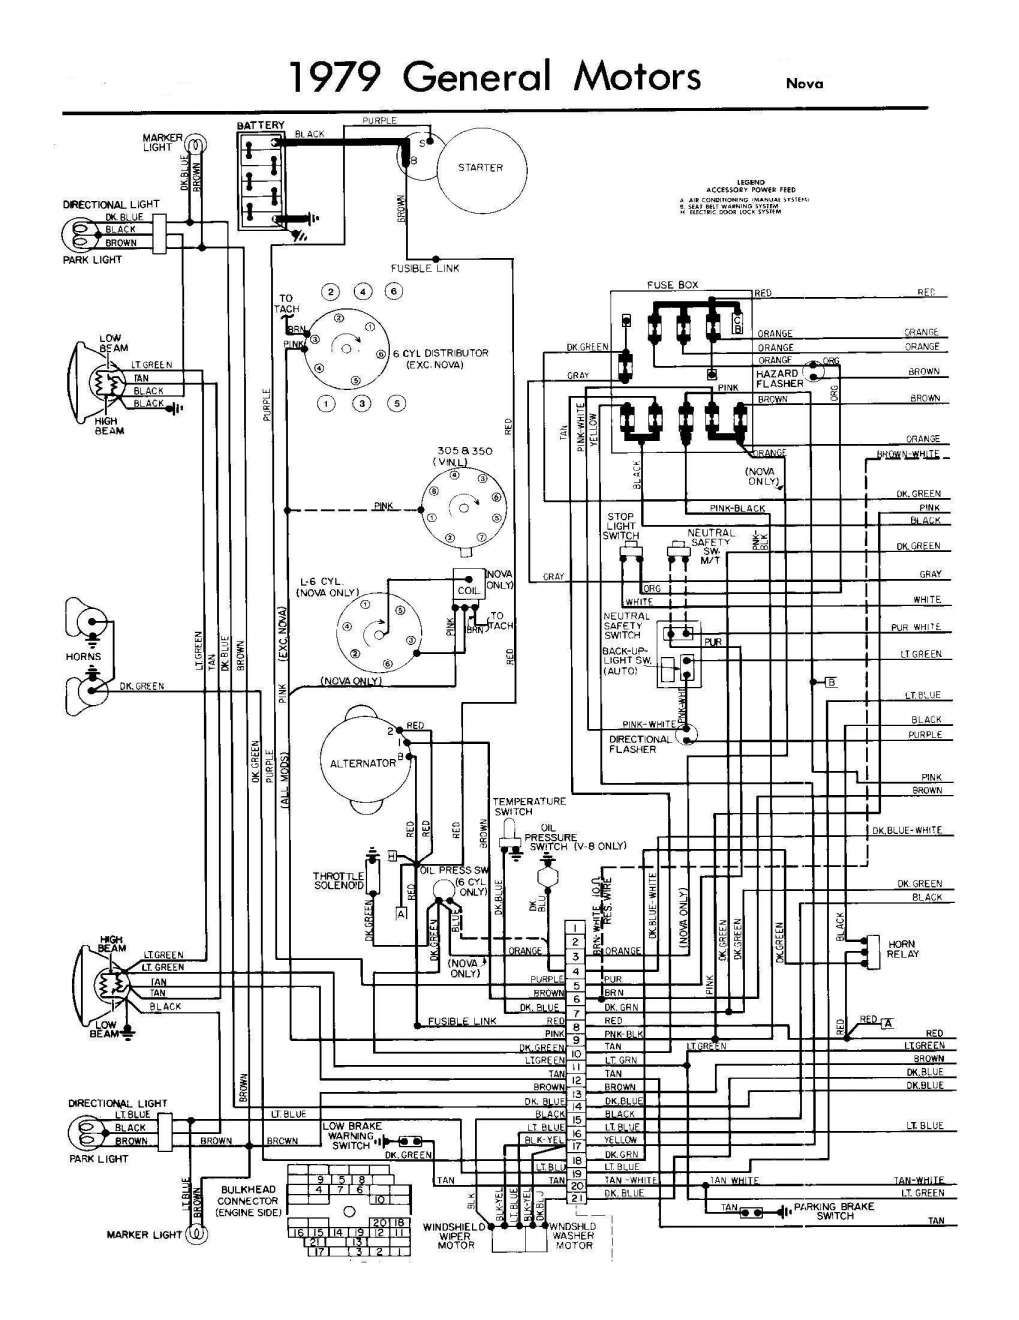 74 Chevy Truck Wiring Diagram - 2006 Fleetwood Bounder Wiring Schematic for Wiring  Diagram SchematicsWiring Diagram Schematics